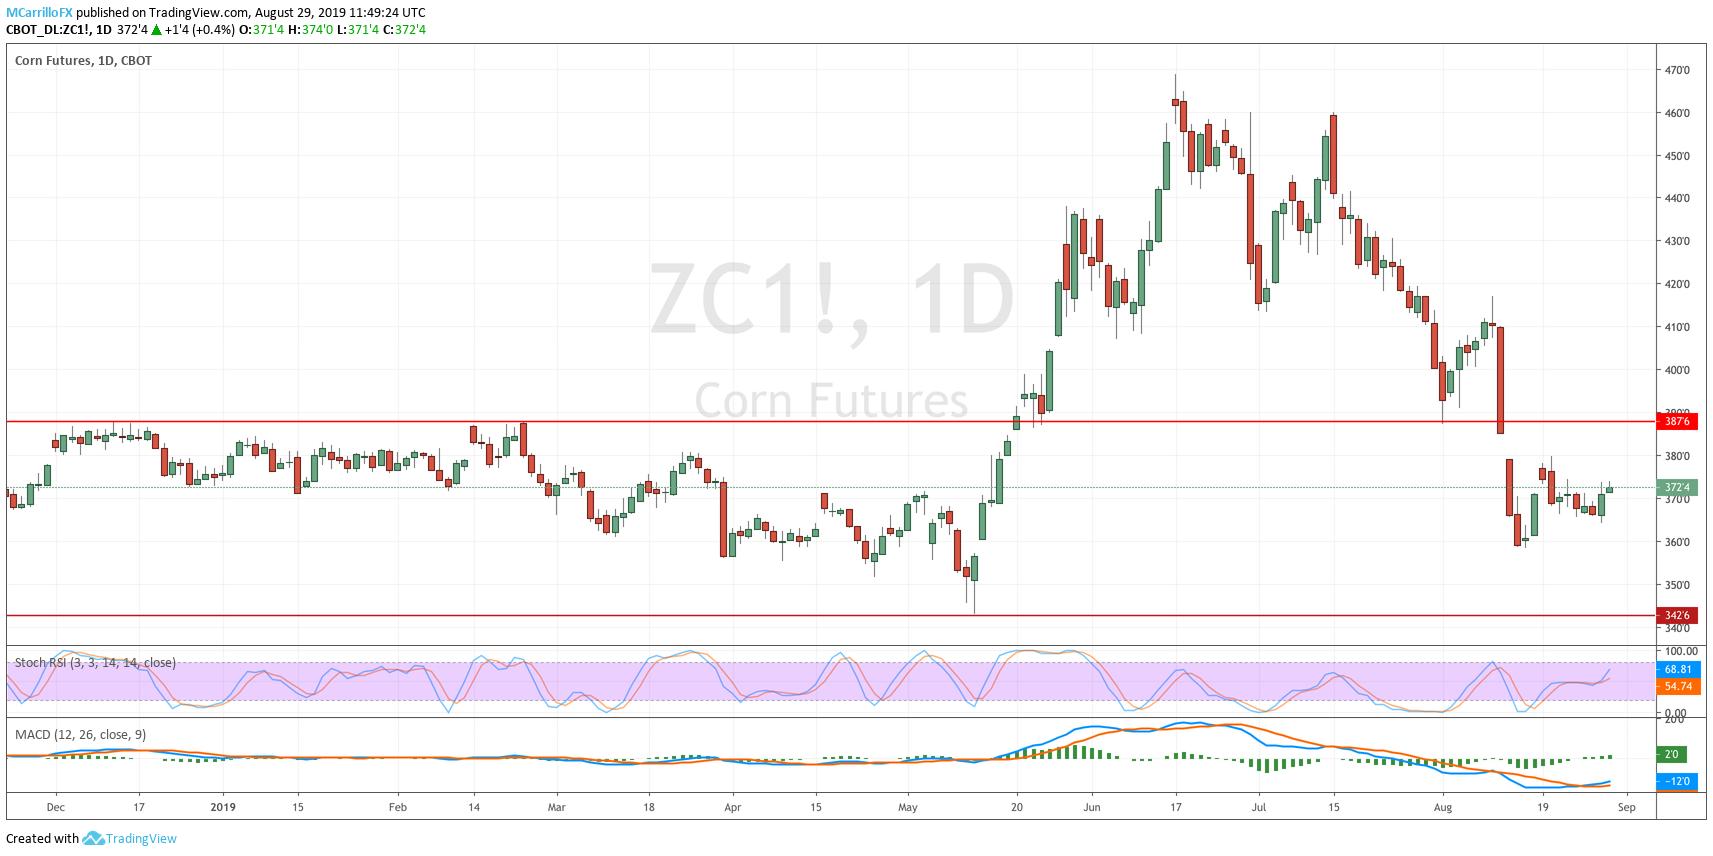 ZC1 Corn Futures 1-hour chart August 29